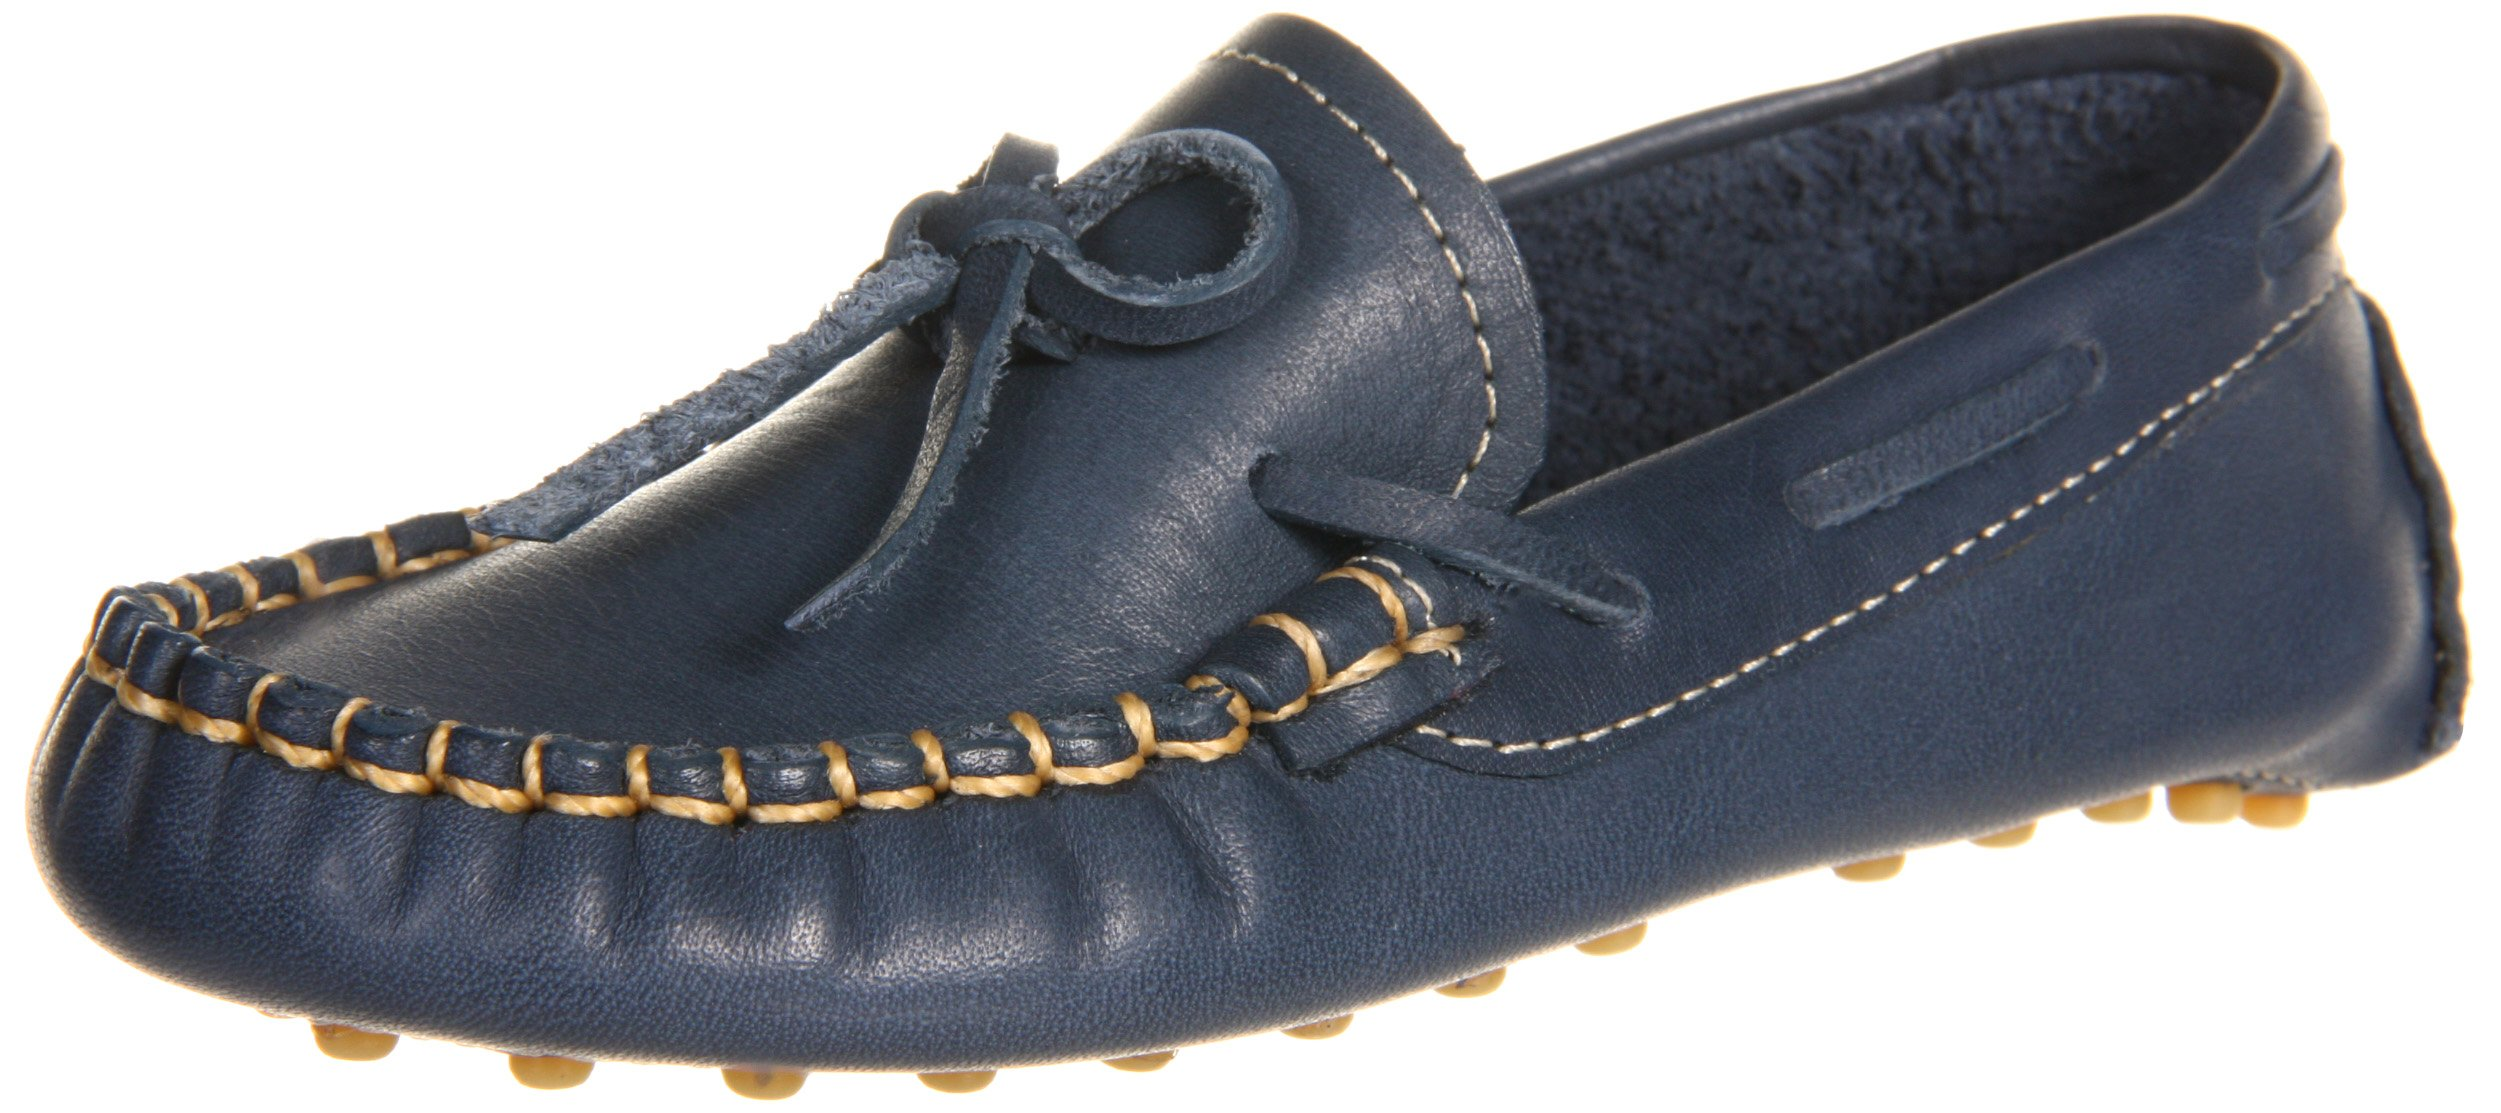 Elephantito Driver Loafers,Navy,9 M US Toddler by Elephantito